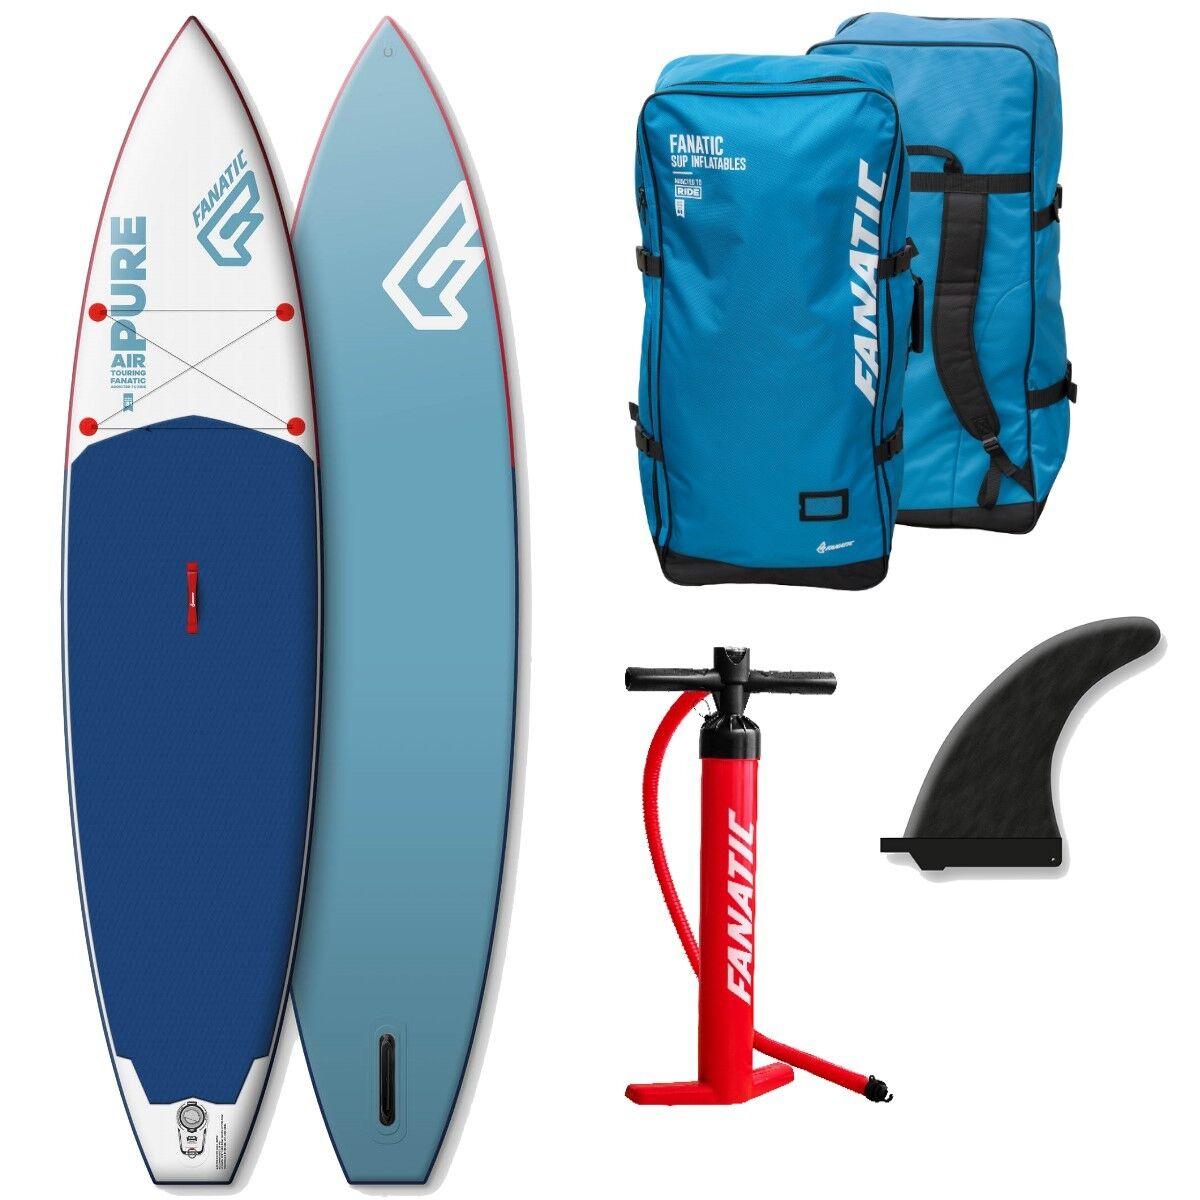 Fanatic Pure Air Touring Hinchable Sup 11.6 Tabla Surf de Remo 2018